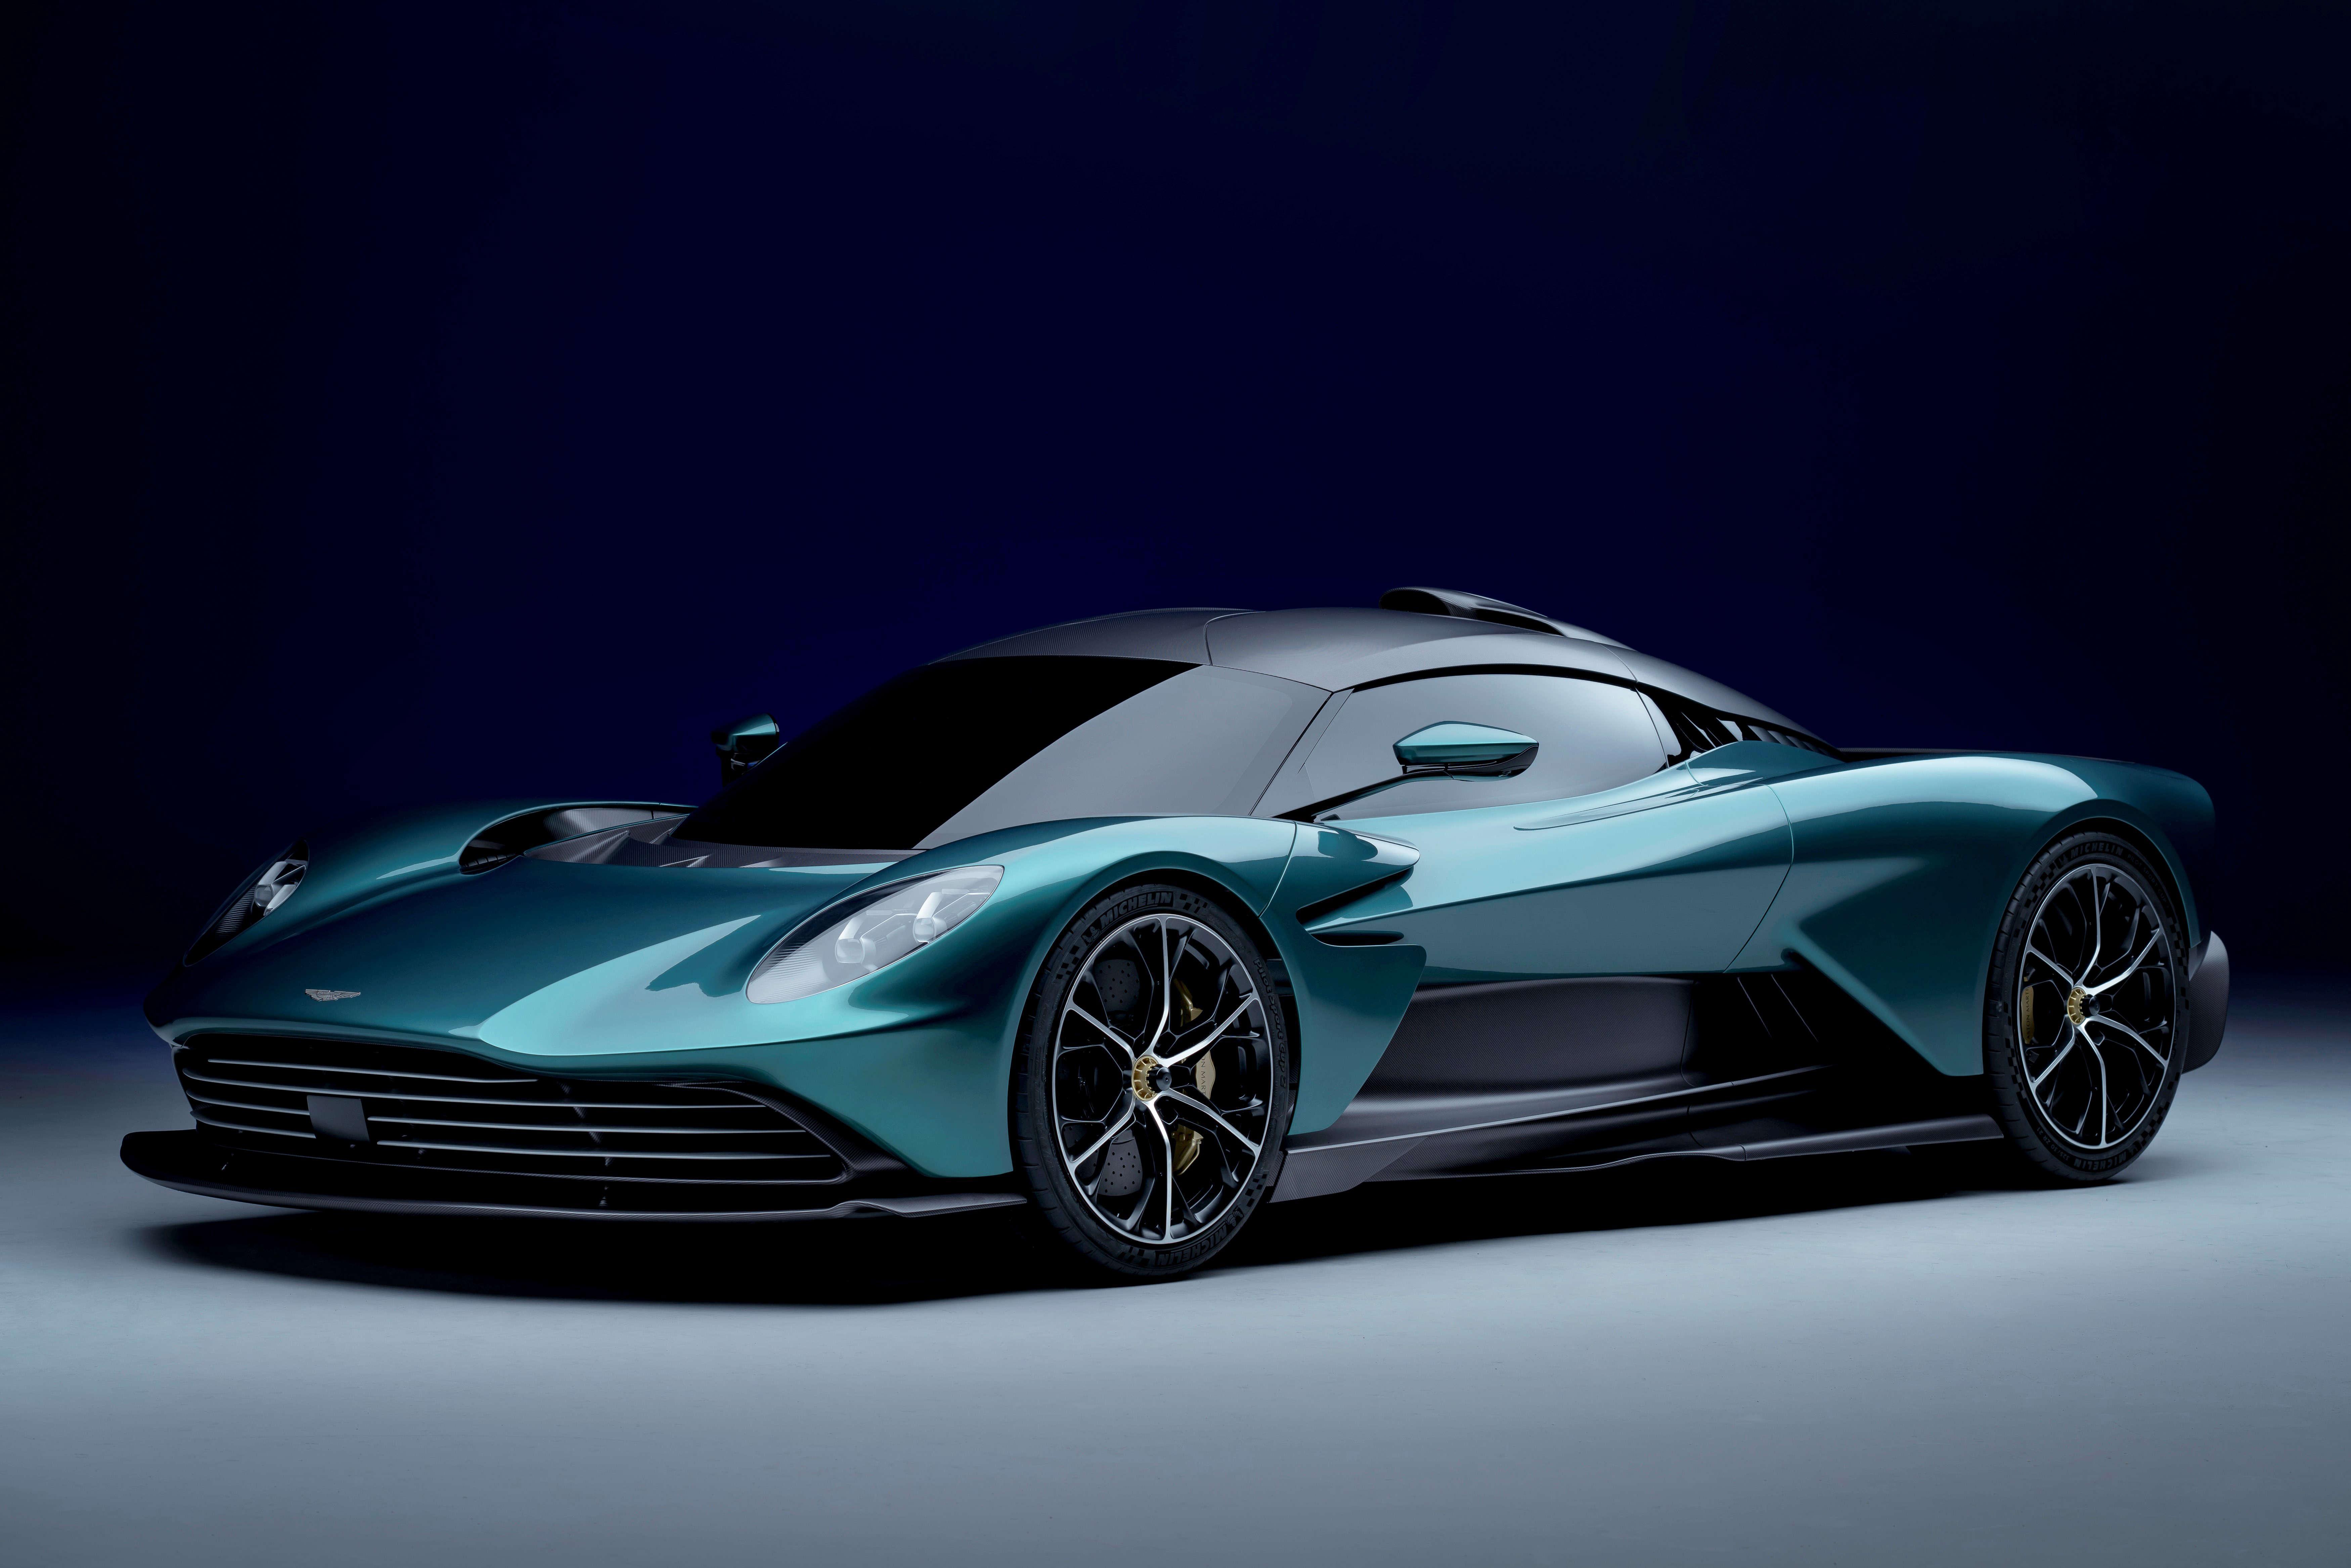 Aston Martin unveils Valhalla hybrid supercar with 937hp V8 engine